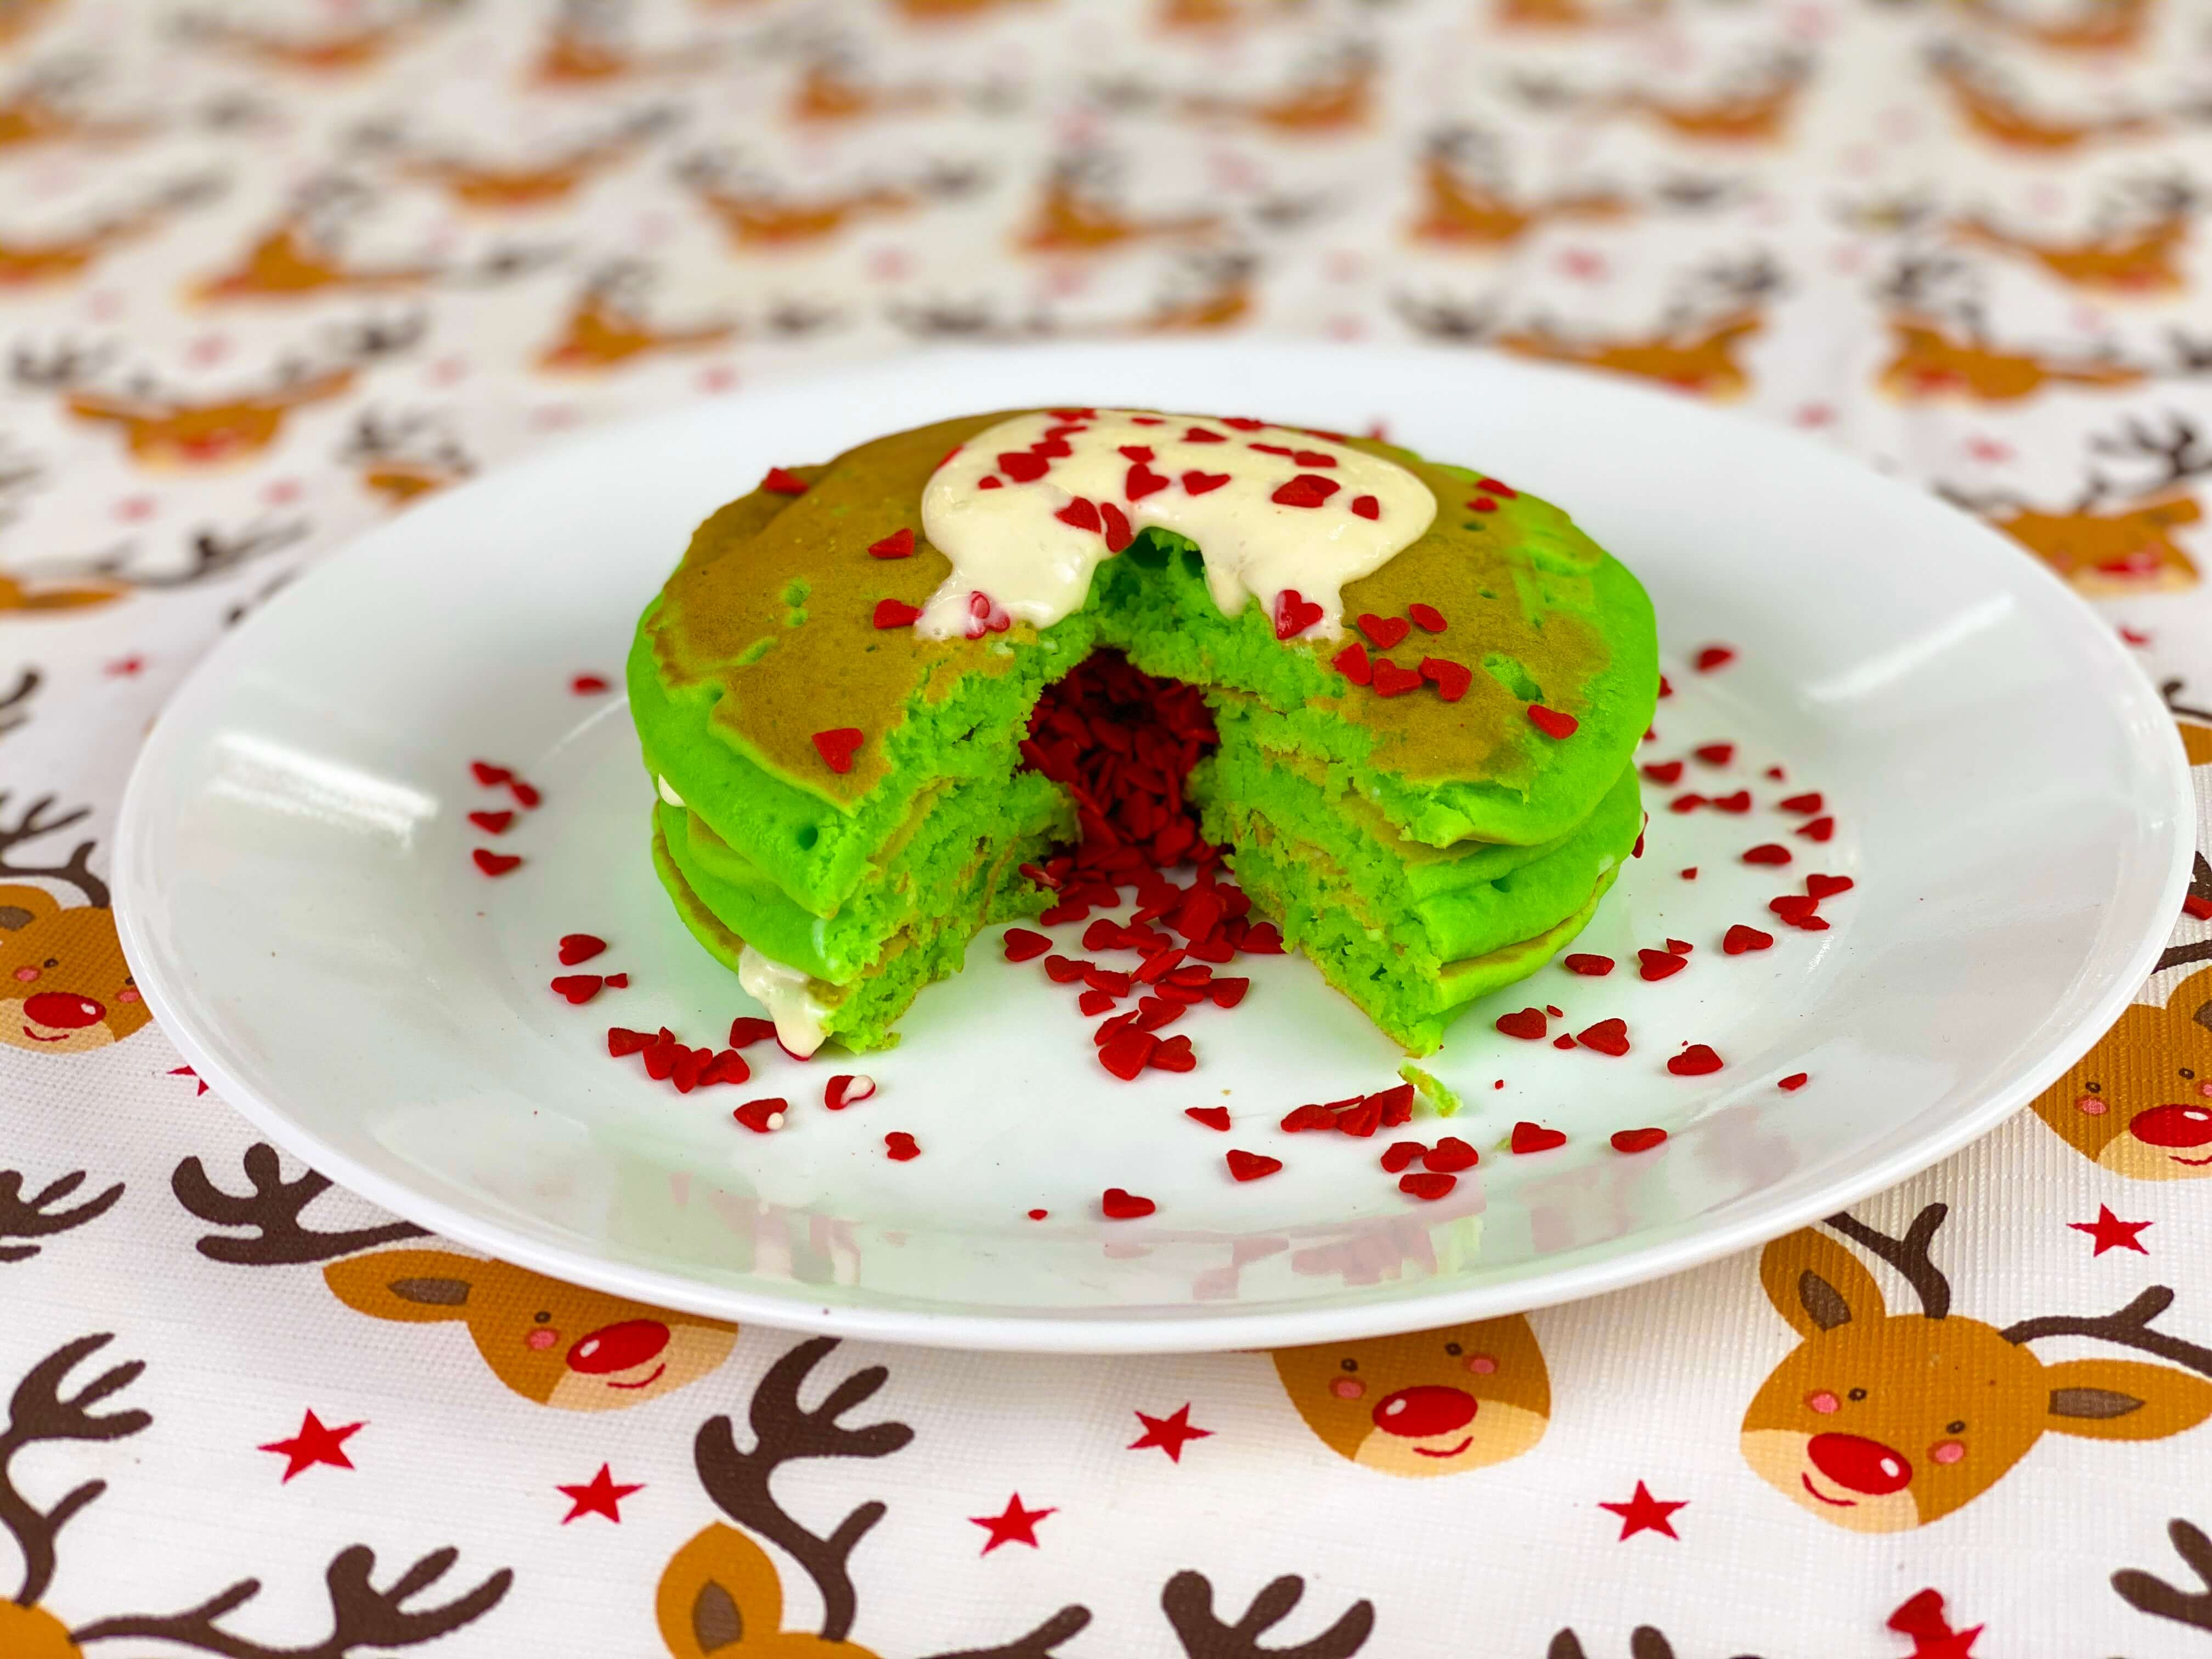 Christmas breakfast ideas - Grinch pancakes